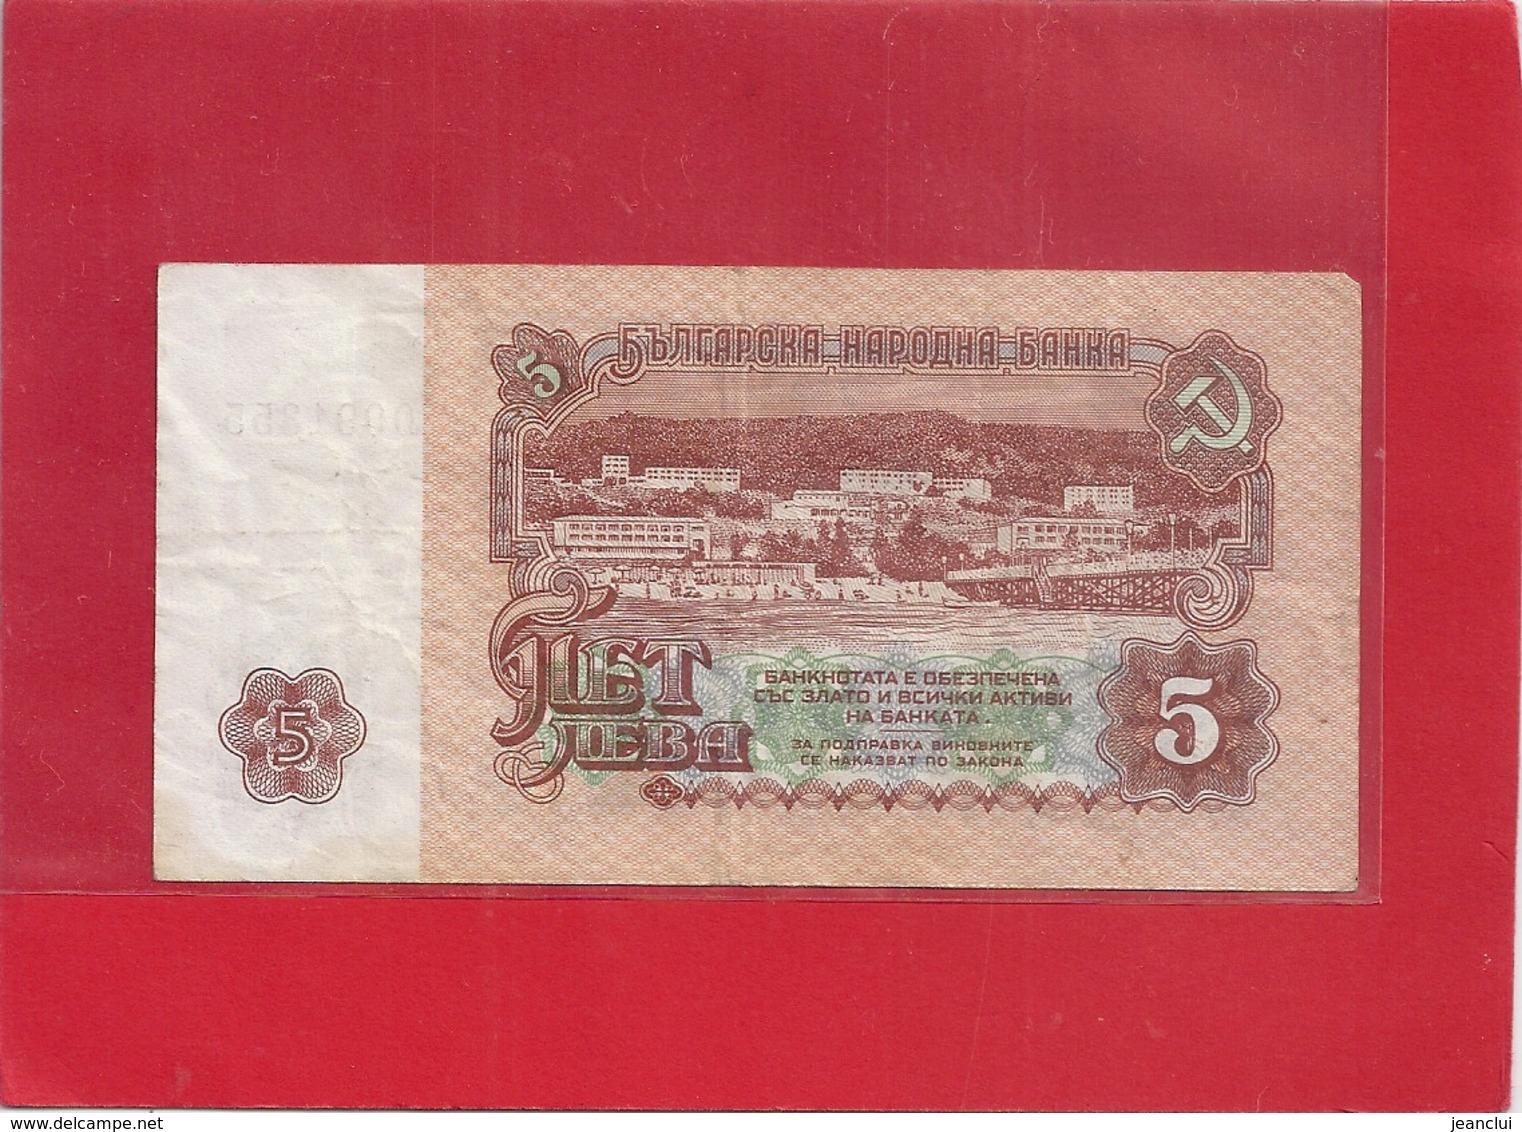 BULGARIE . 5 LEVA . 1974 . N° OA 0091355 . 2 SCANES - Bulgarie